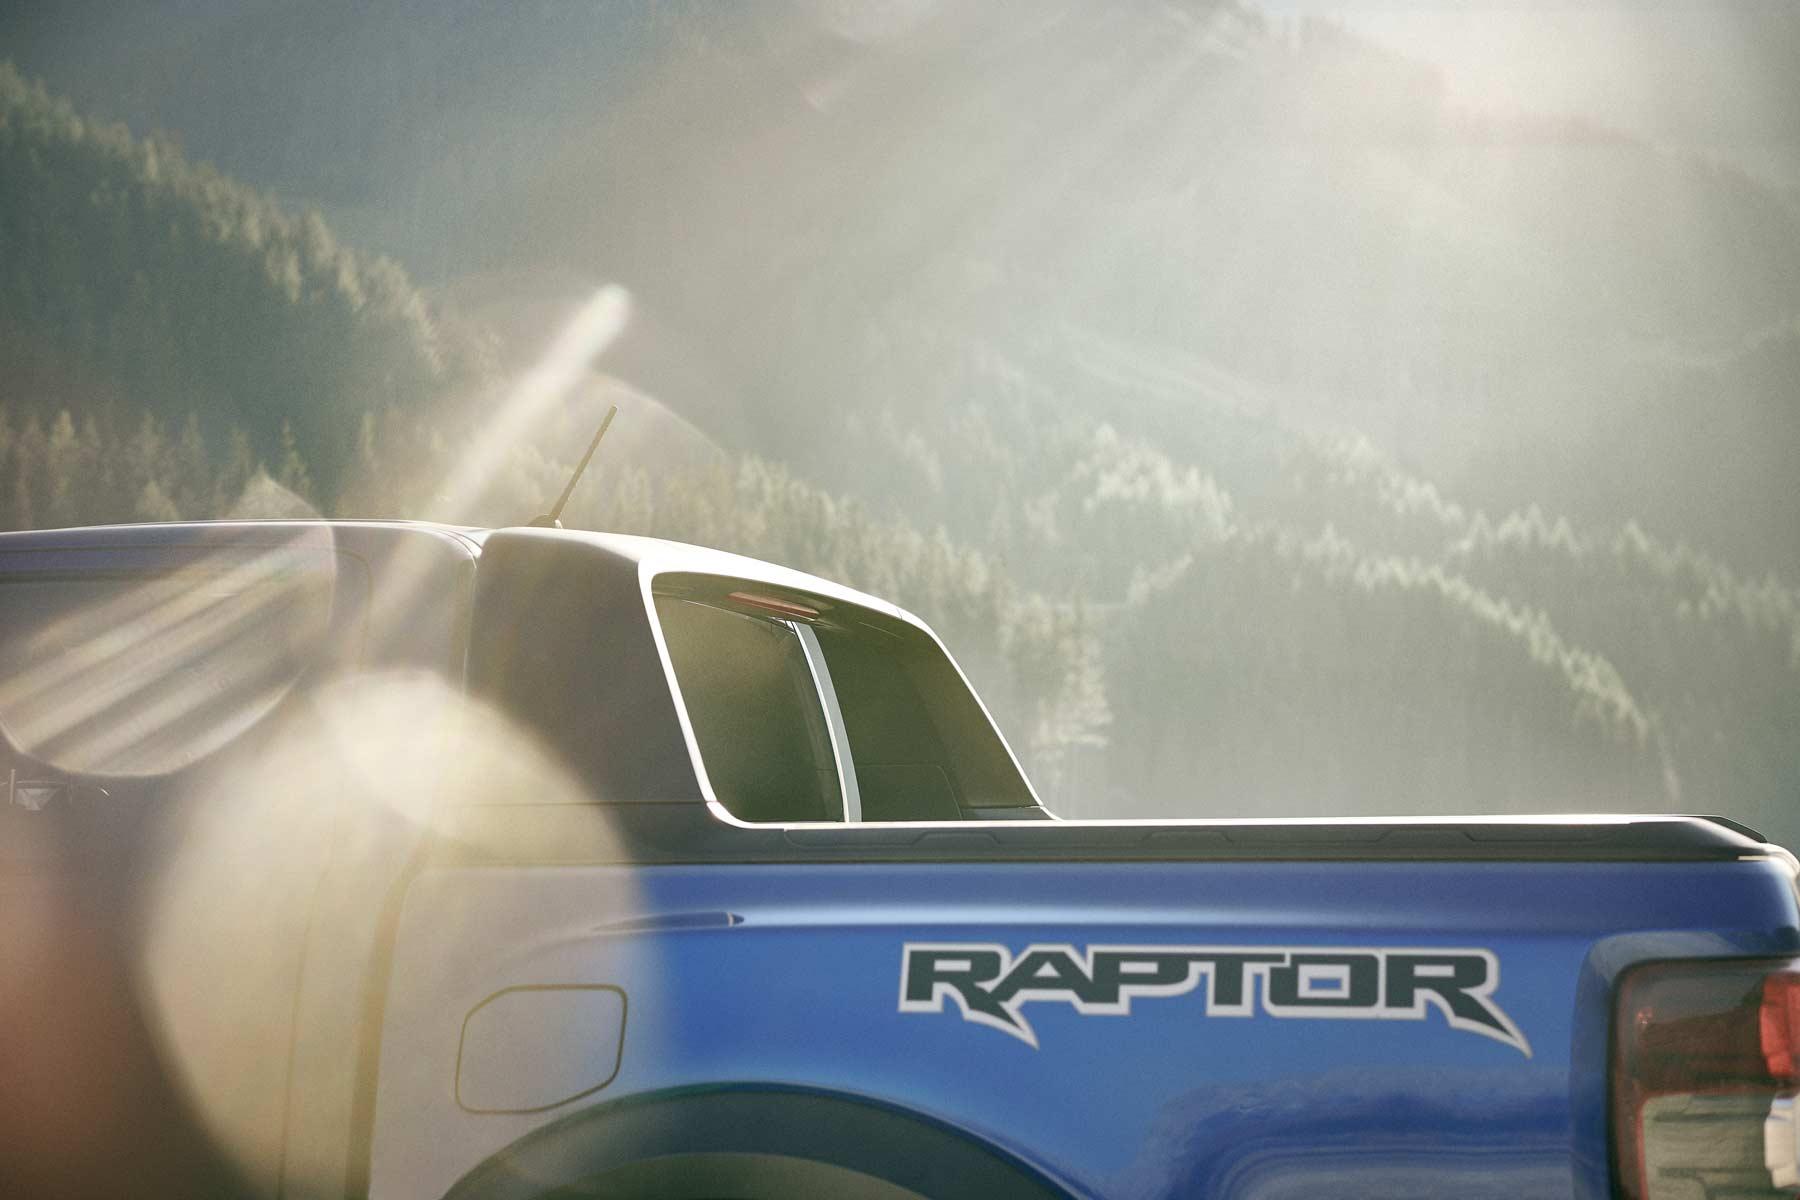 Ford Ranger Raptor 6_2018_ford_ranger_raptor_shot26_rear_side_detail_v1